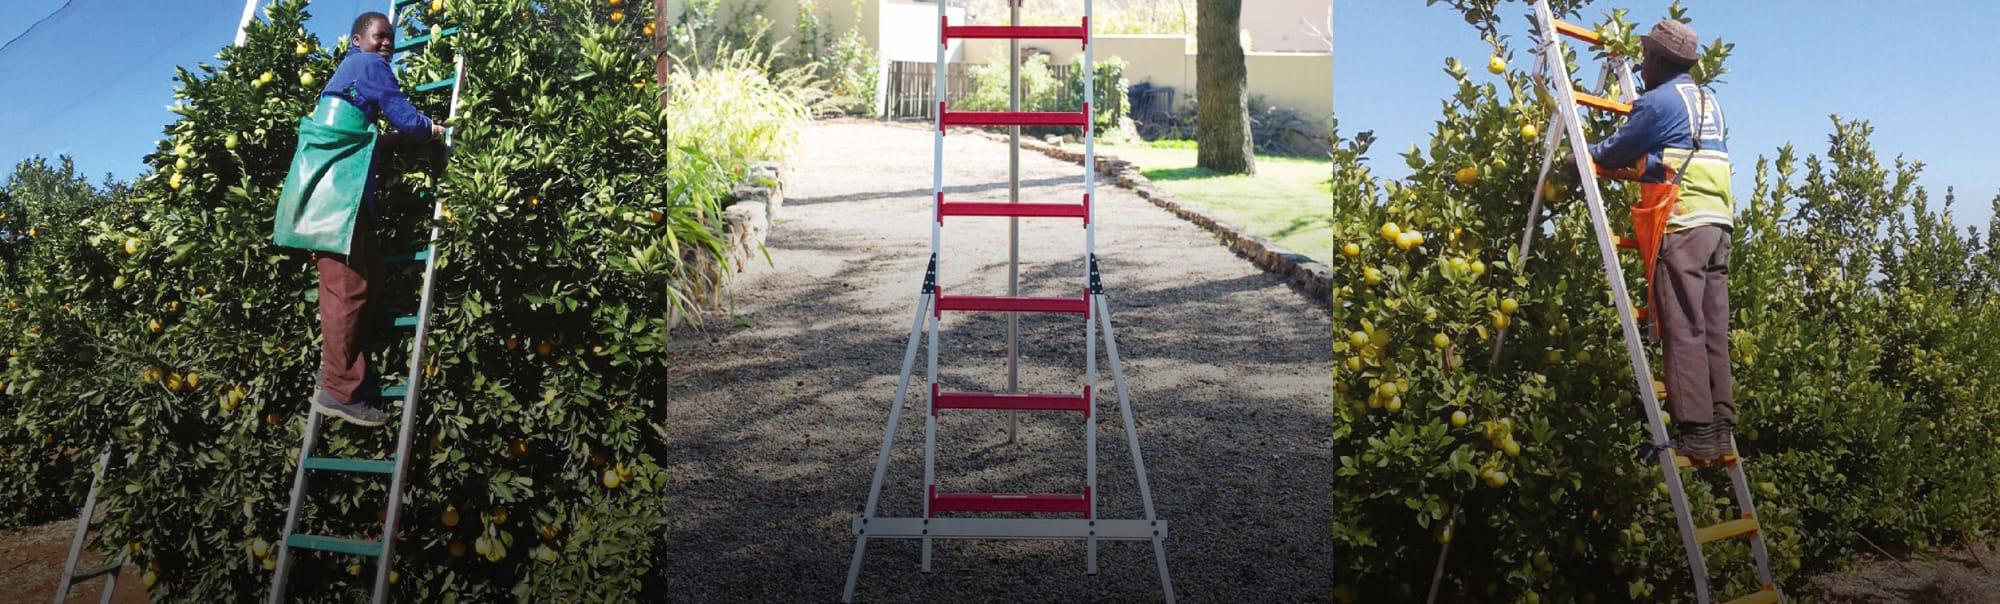 Fruit picking ladders robust, light & innovative ladders